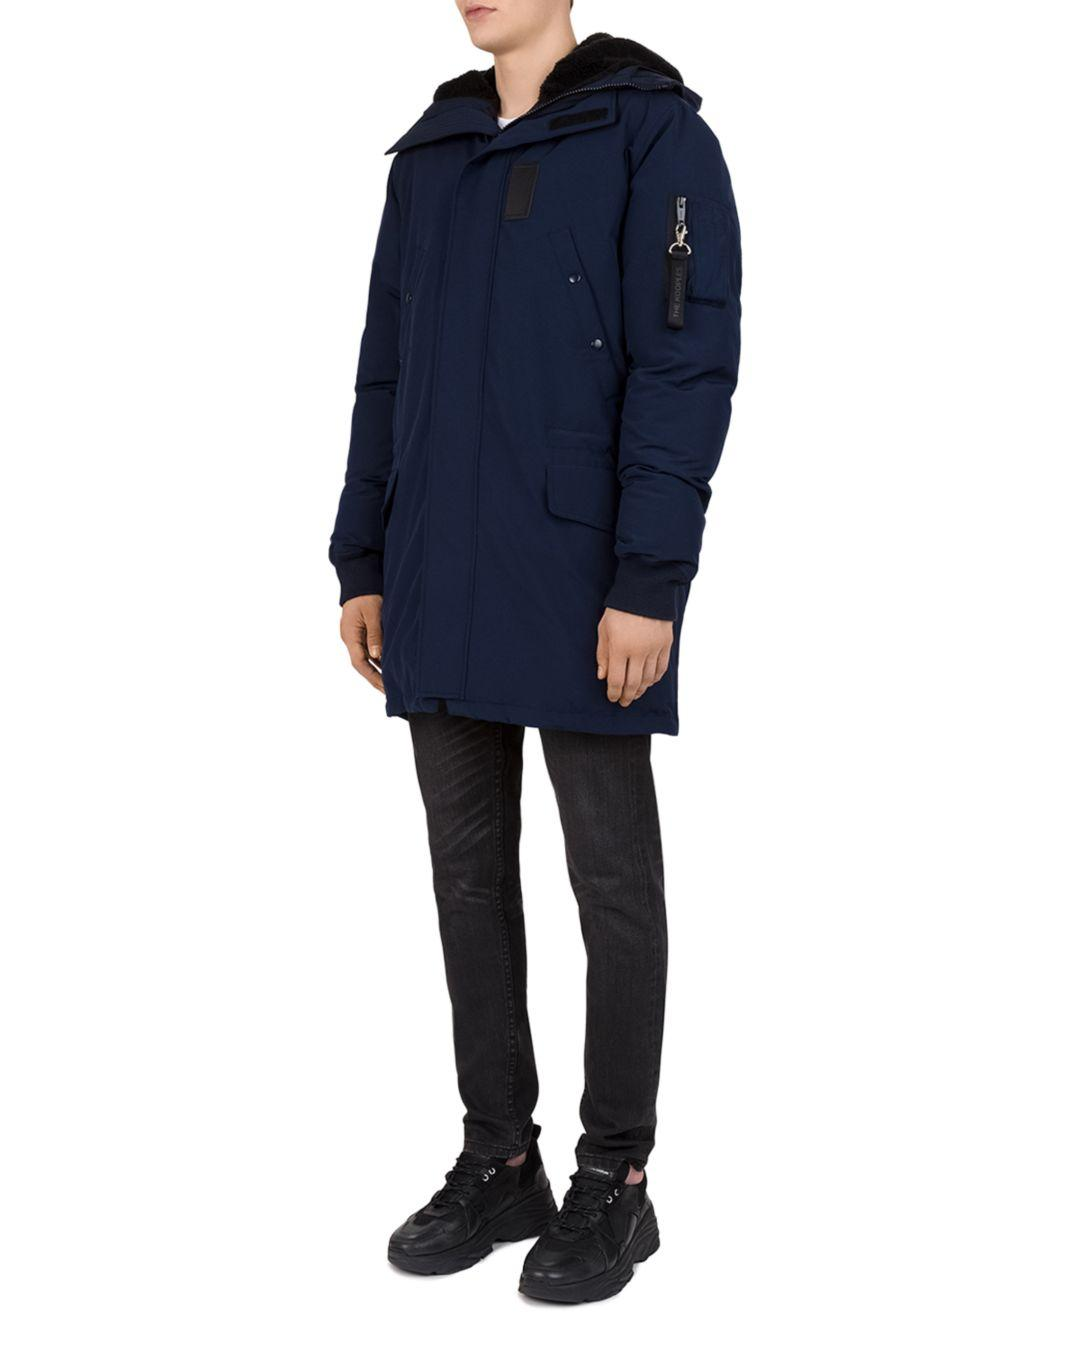 76895734fa The Kooples - Blue Mixed - Media Puffa Parka Jacket for Men - Lyst. View  fullscreen